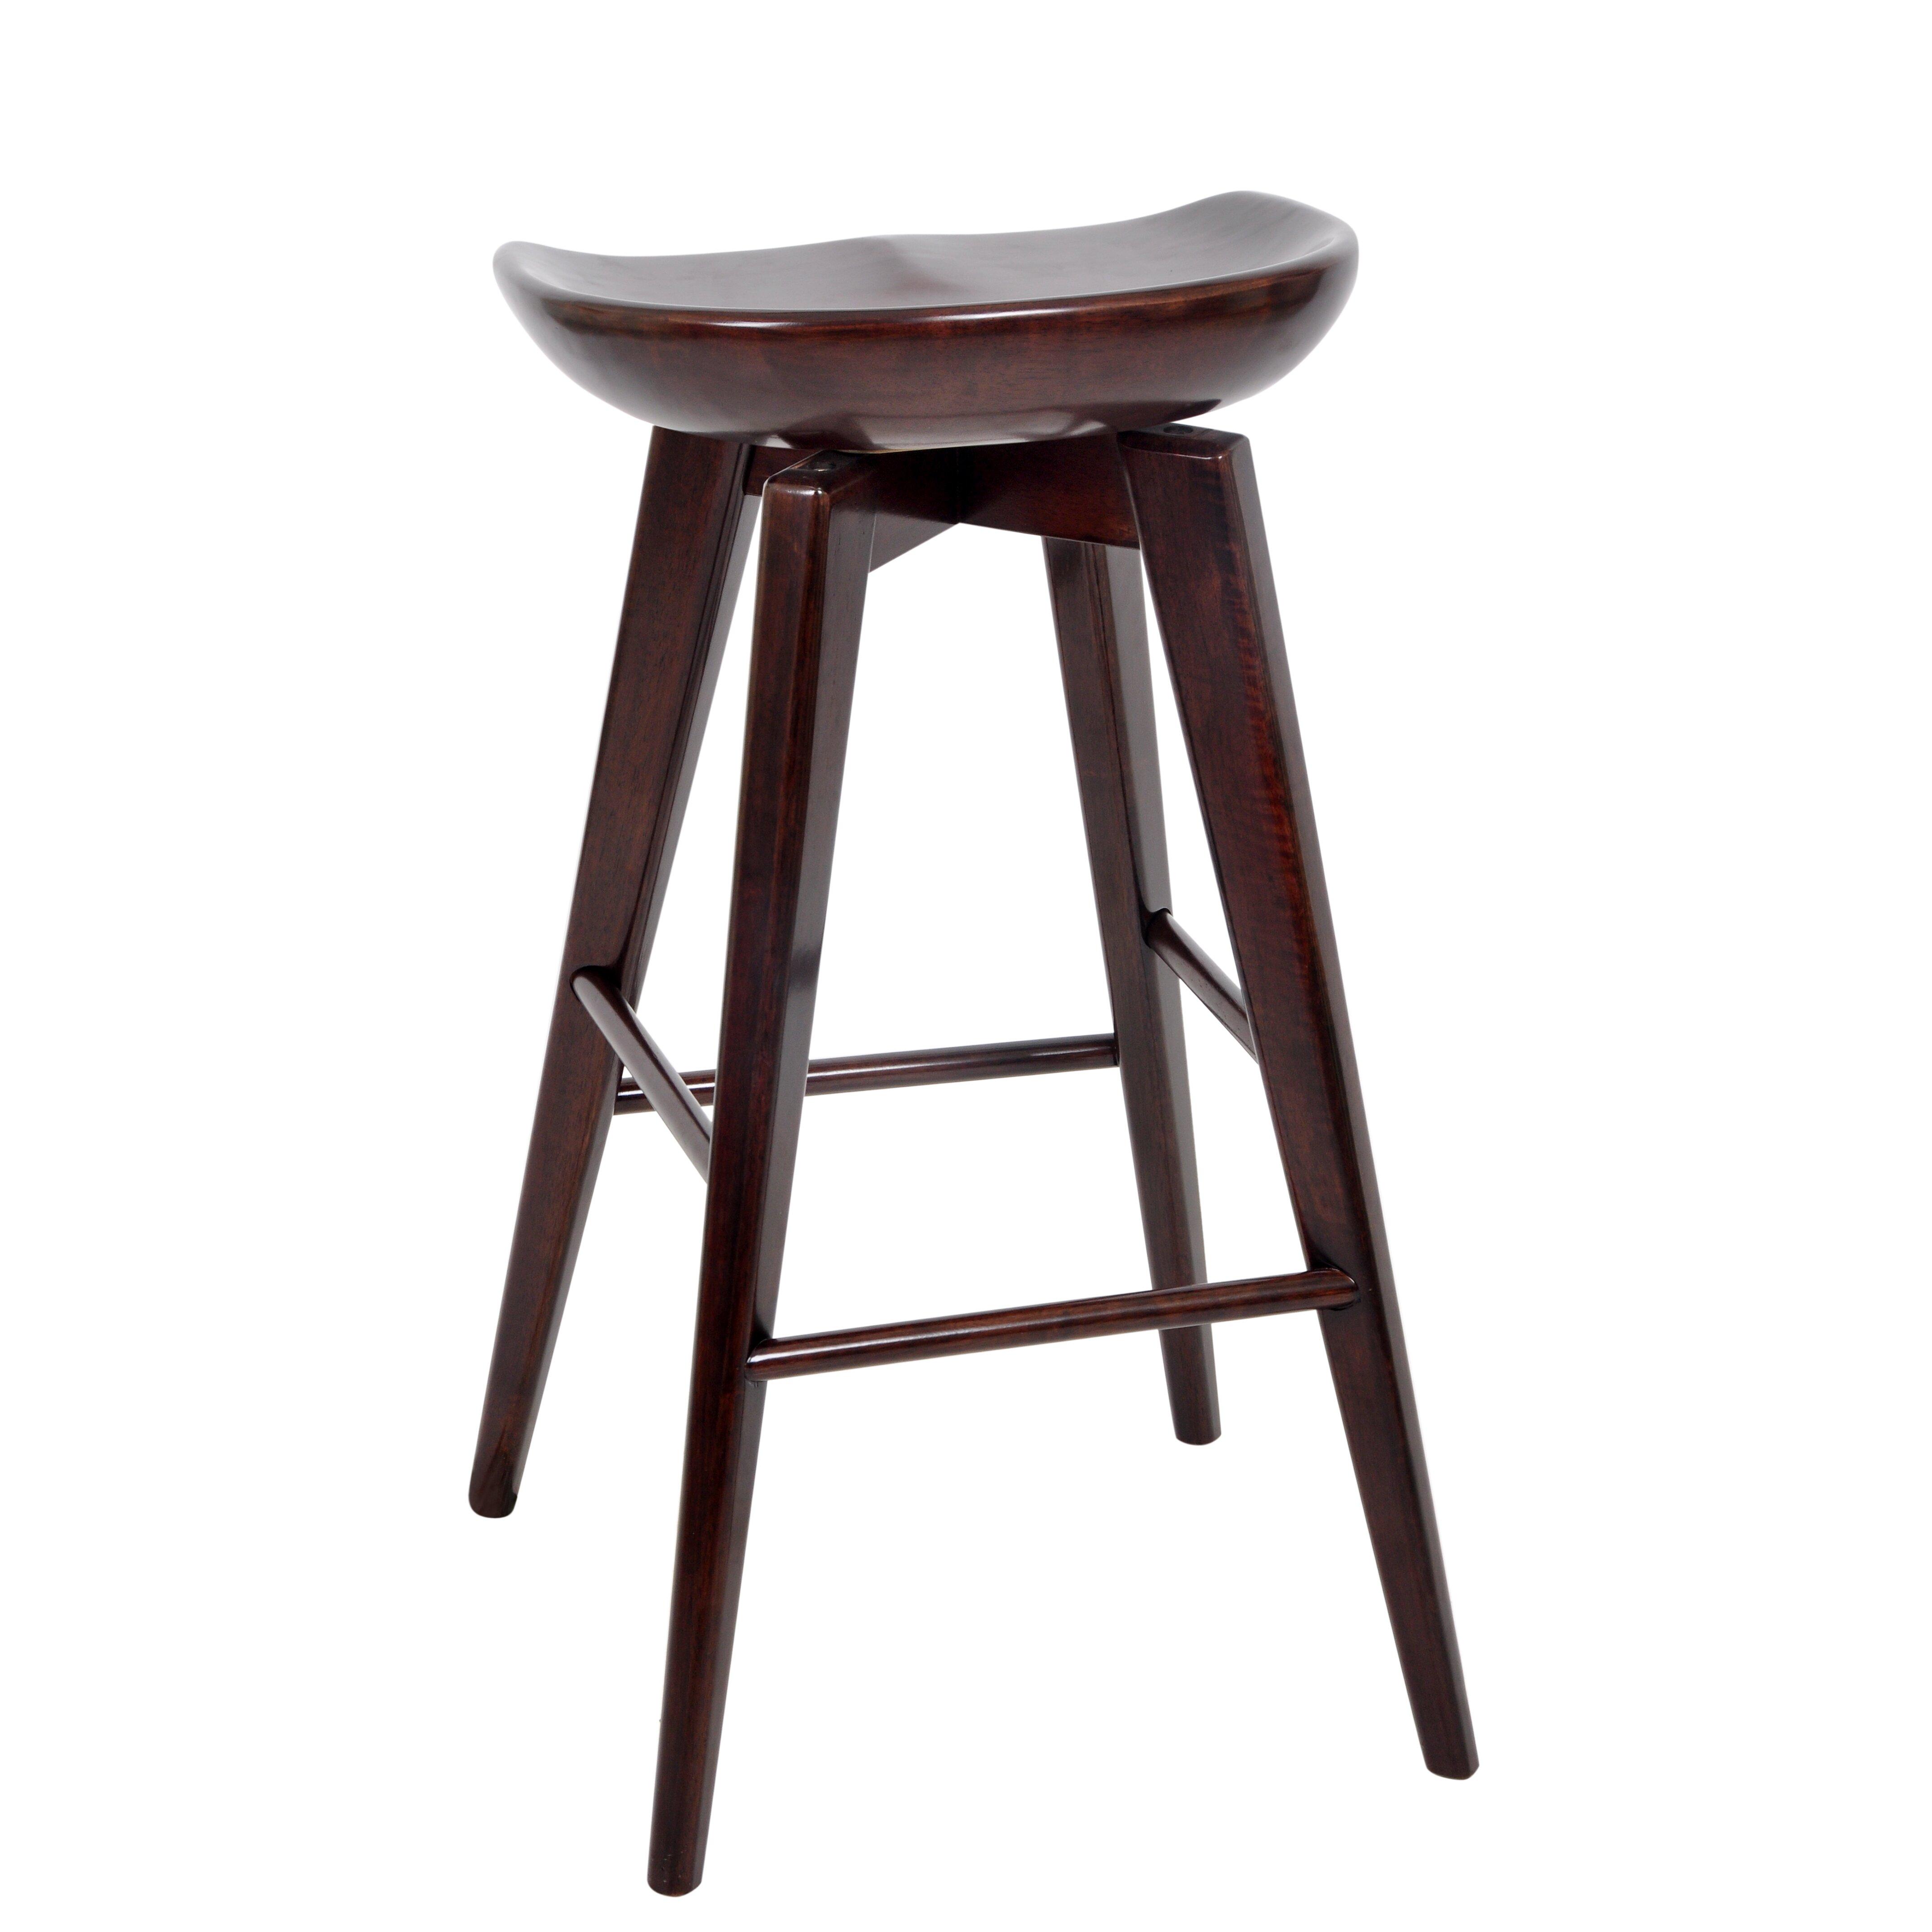 stress colored stool : Mercury Row Reg Venus 24 Quot